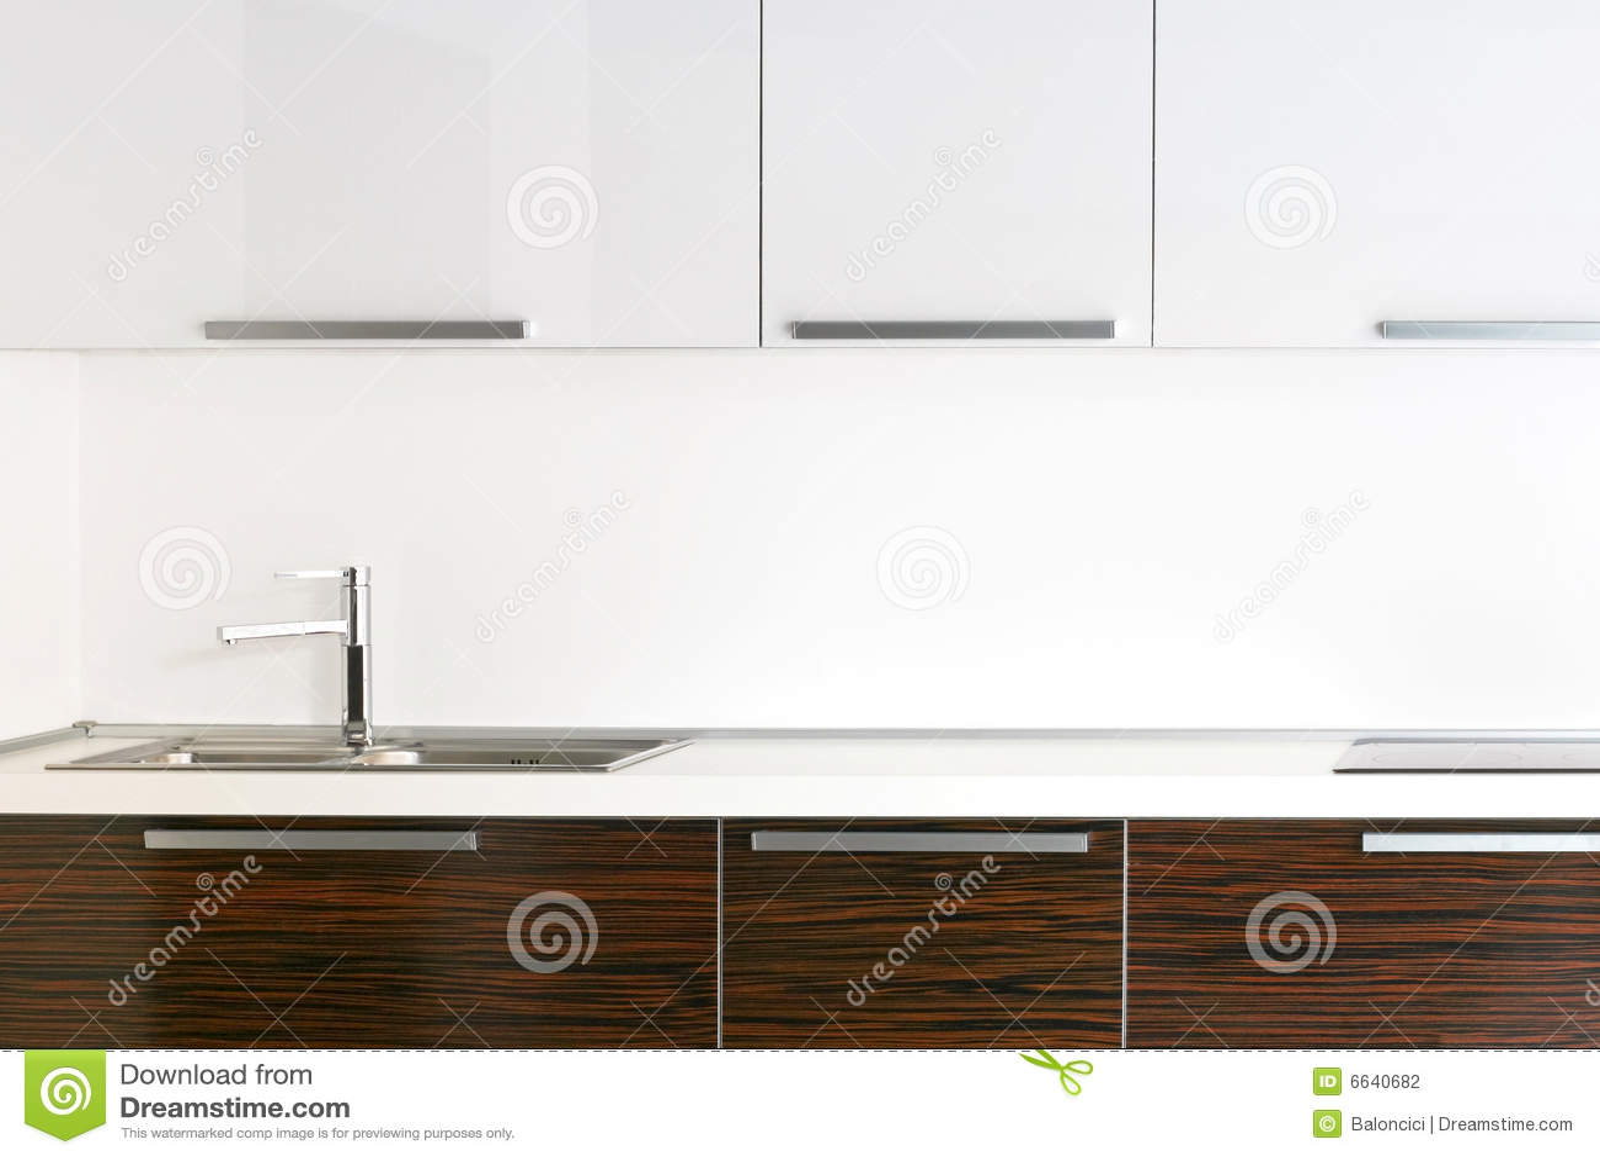 Bright kitchen counter